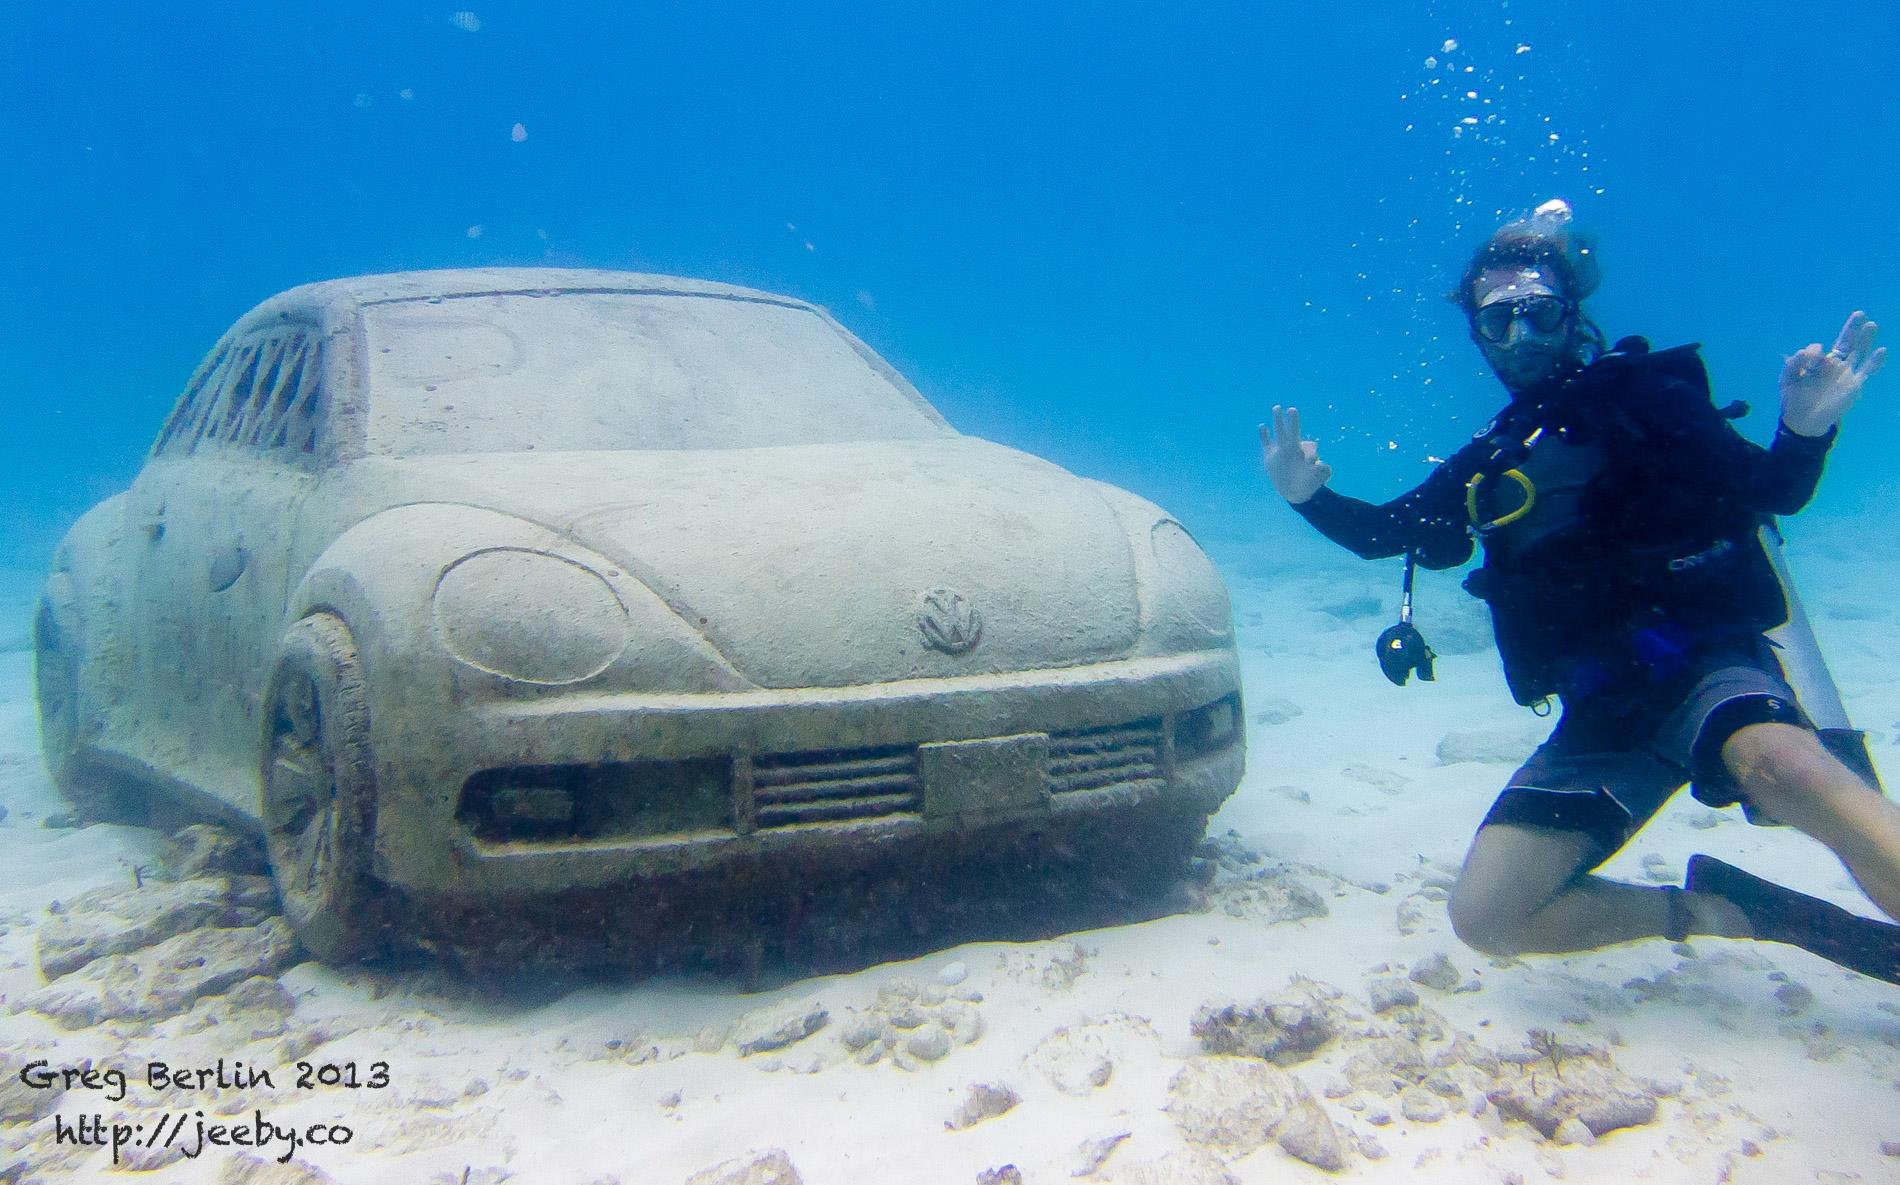 2013-Underwater-statues-at-Musa-Underwater-Park-near-Isla-Mujeres-2.jpg